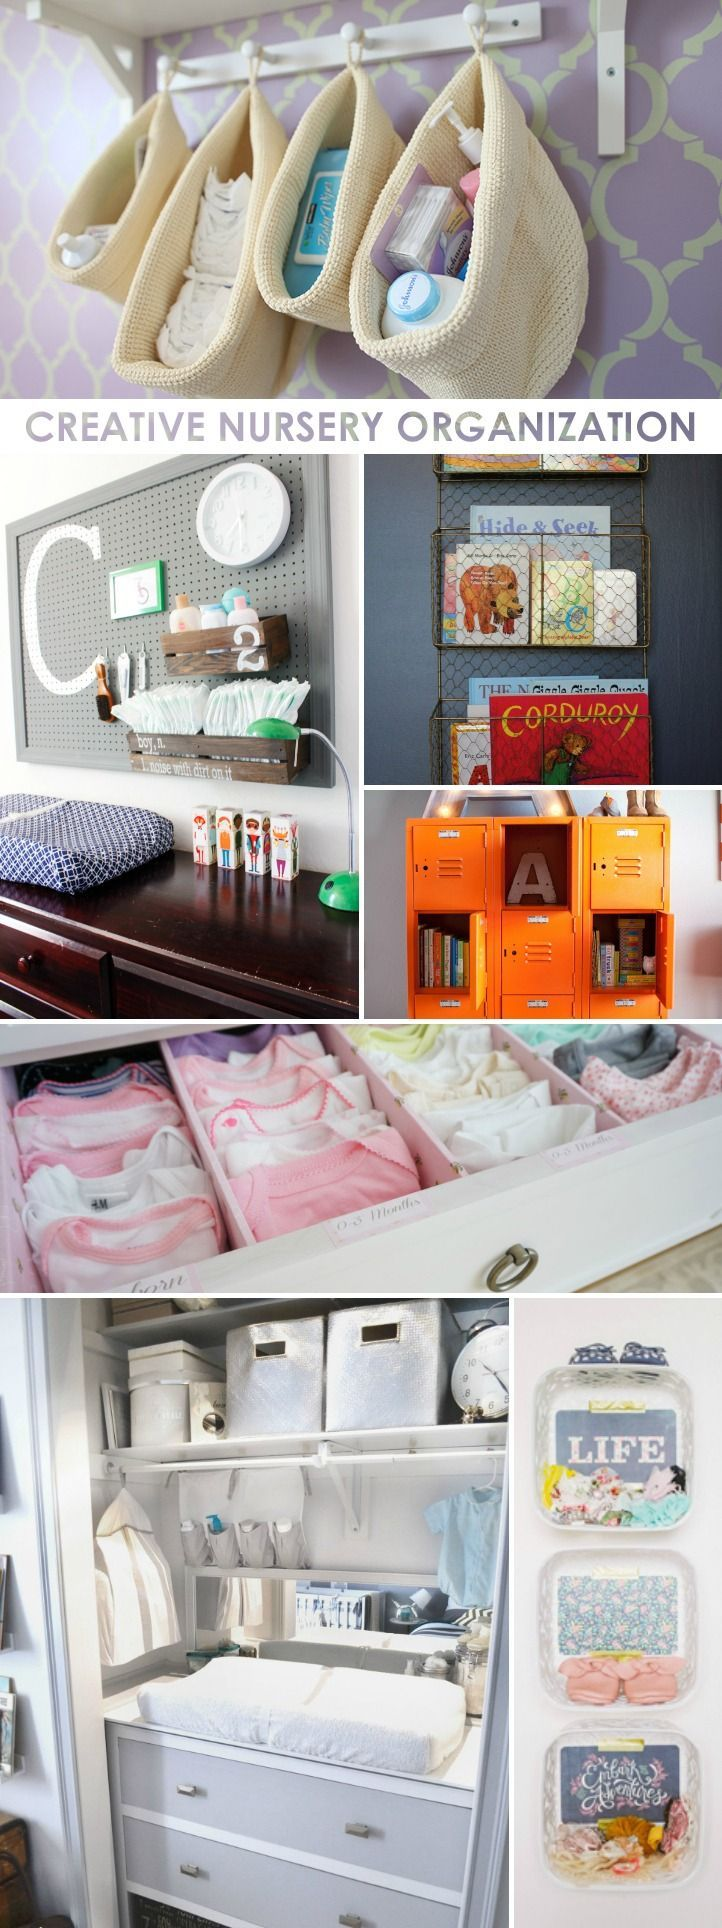 Nursery Organization Inspiration | via projectnursery.com #baby